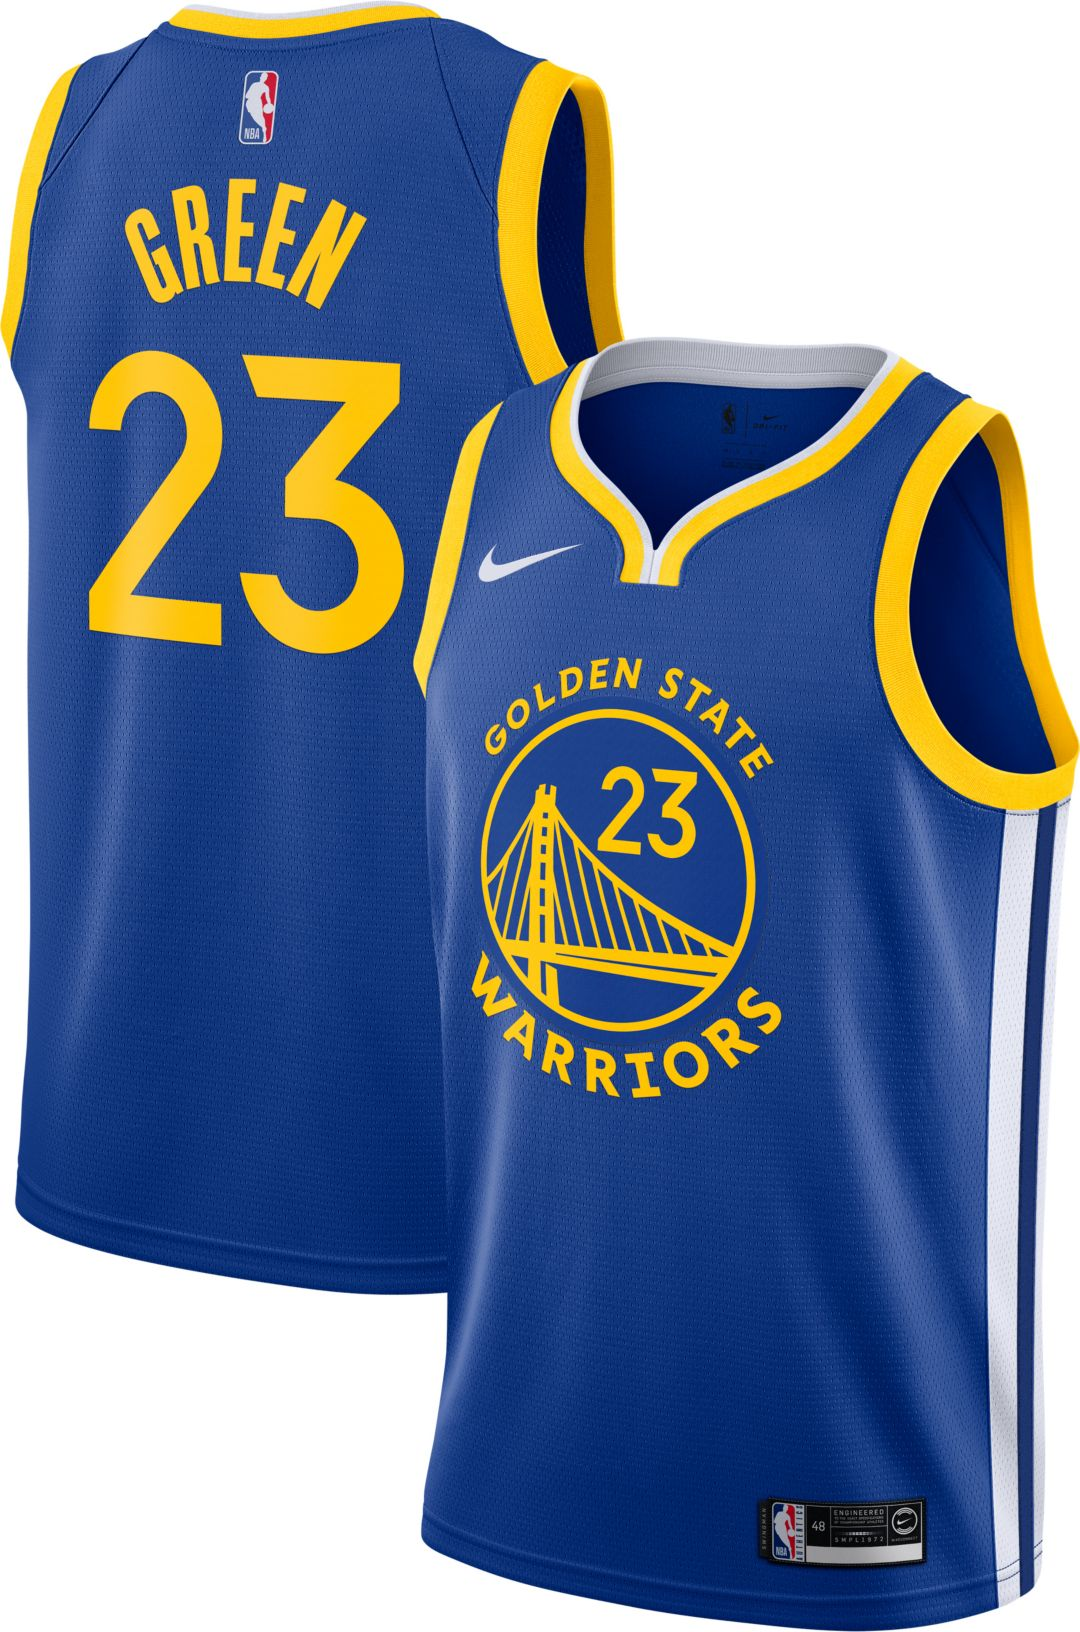 size 40 5c791 e42ee Nike Men's Golden State Warriors Draymond Green #23 Royal Dri-FIT Swingman  Jersey